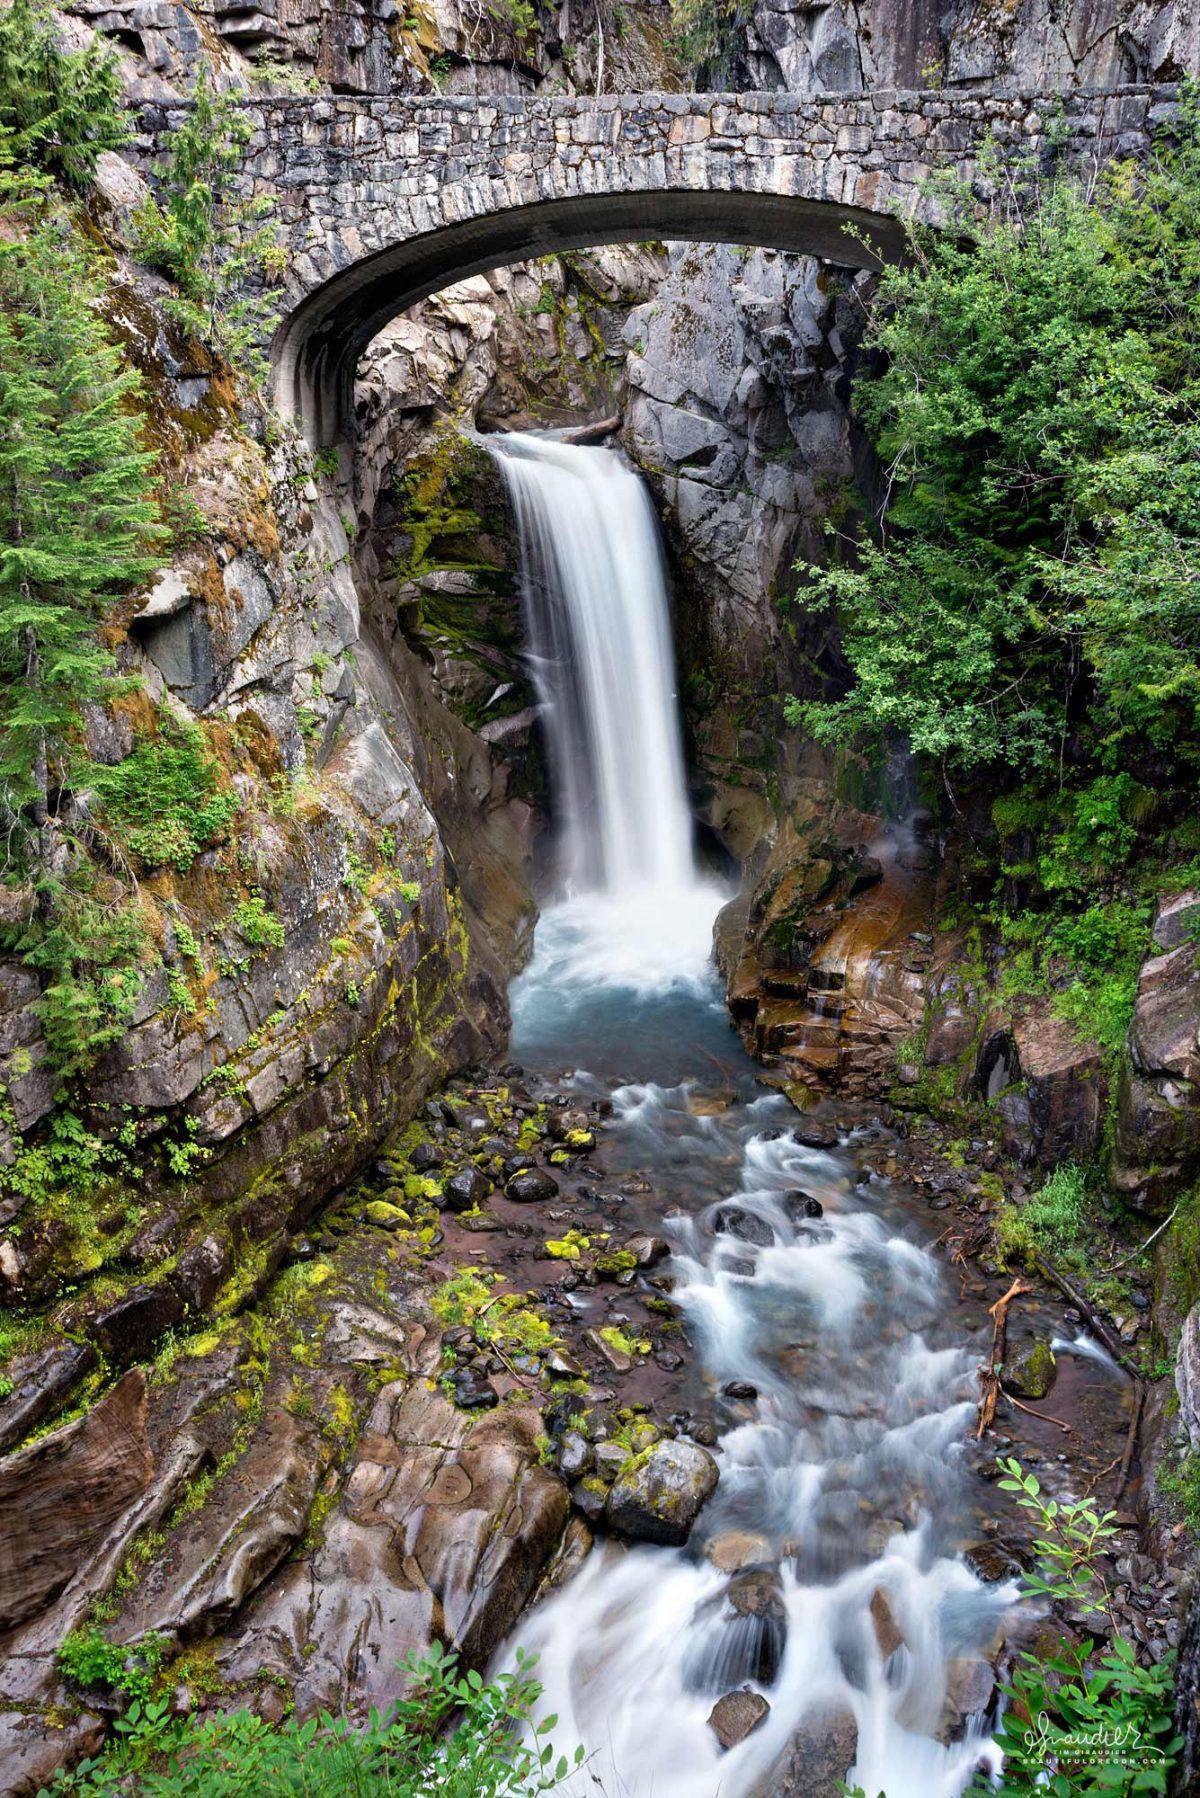 Christine Falls, beautifully framed by the stone masonry of the S.R.706 bridge. Mount Rainier National Park, Washington Cascades.